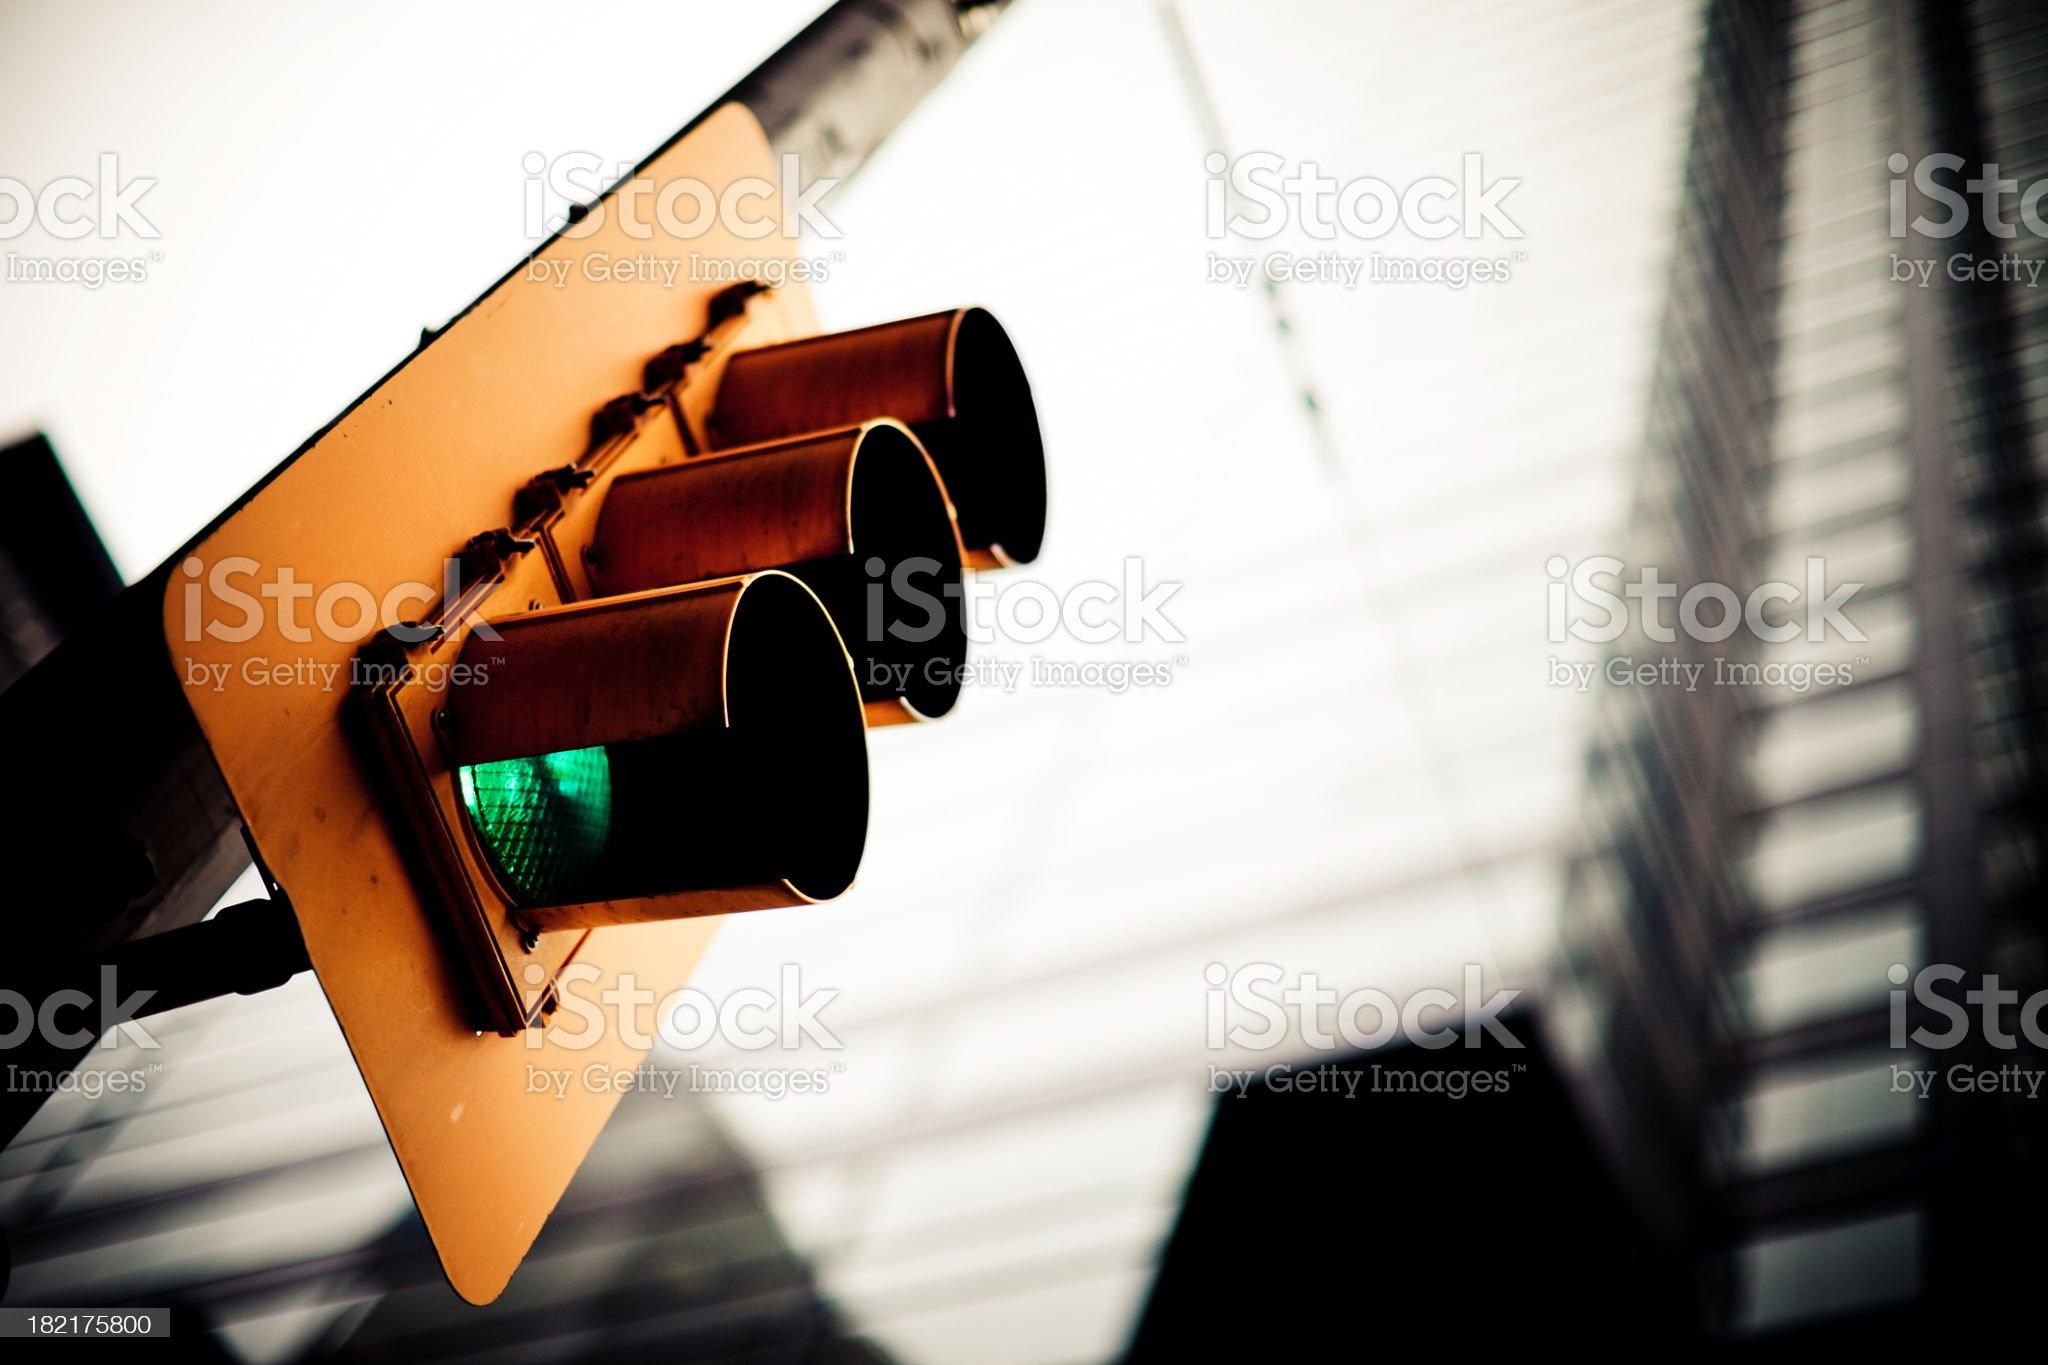 Traffic lights goes green royalty-free stock photo